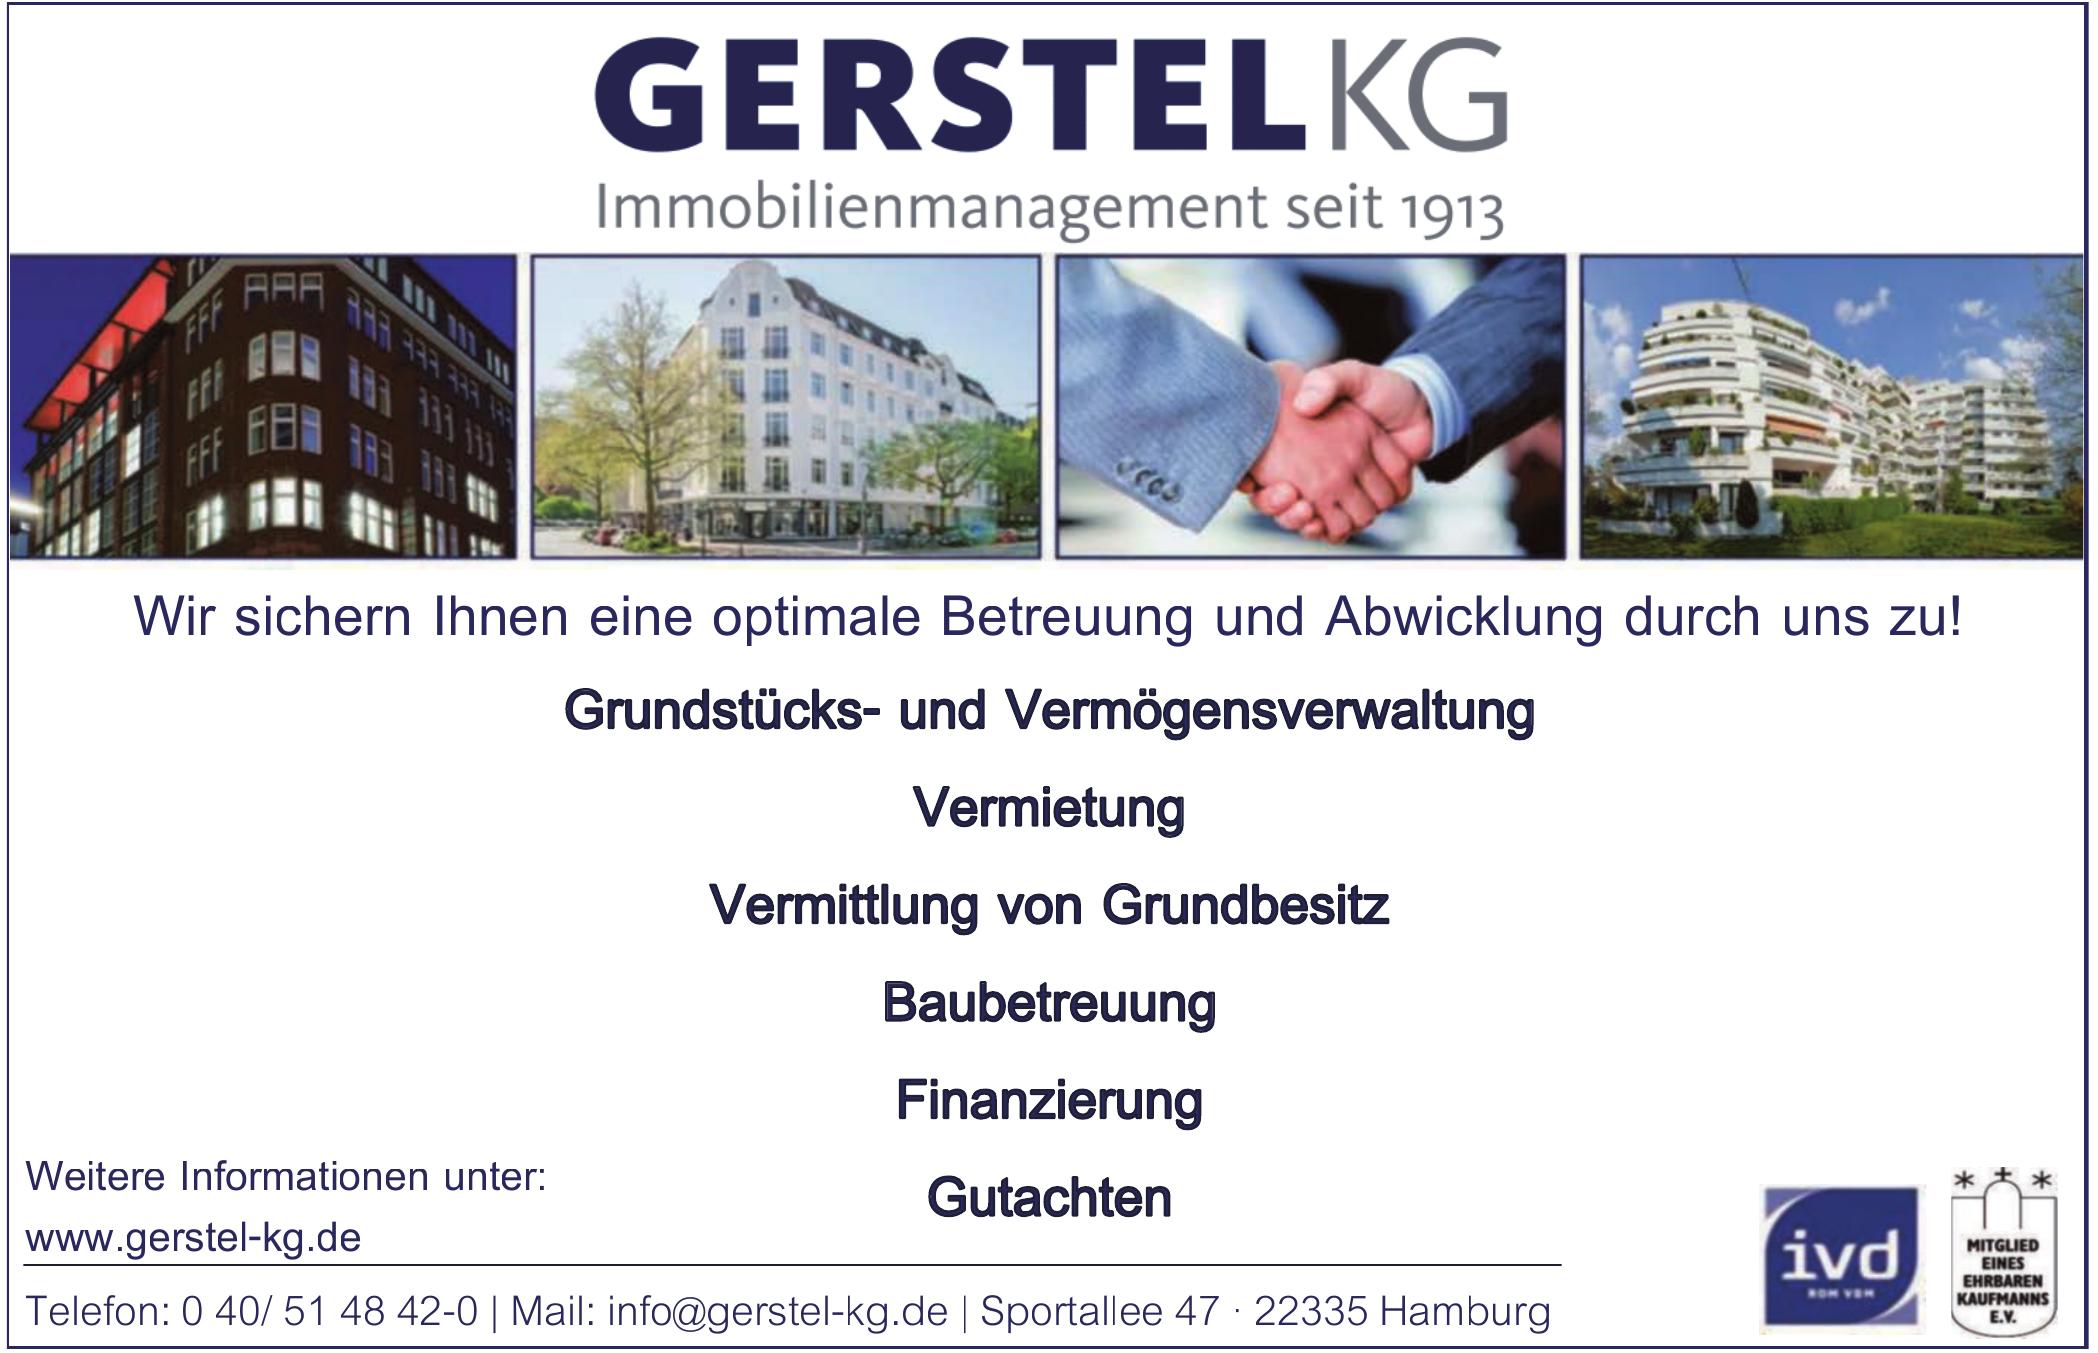 Gerstel KG